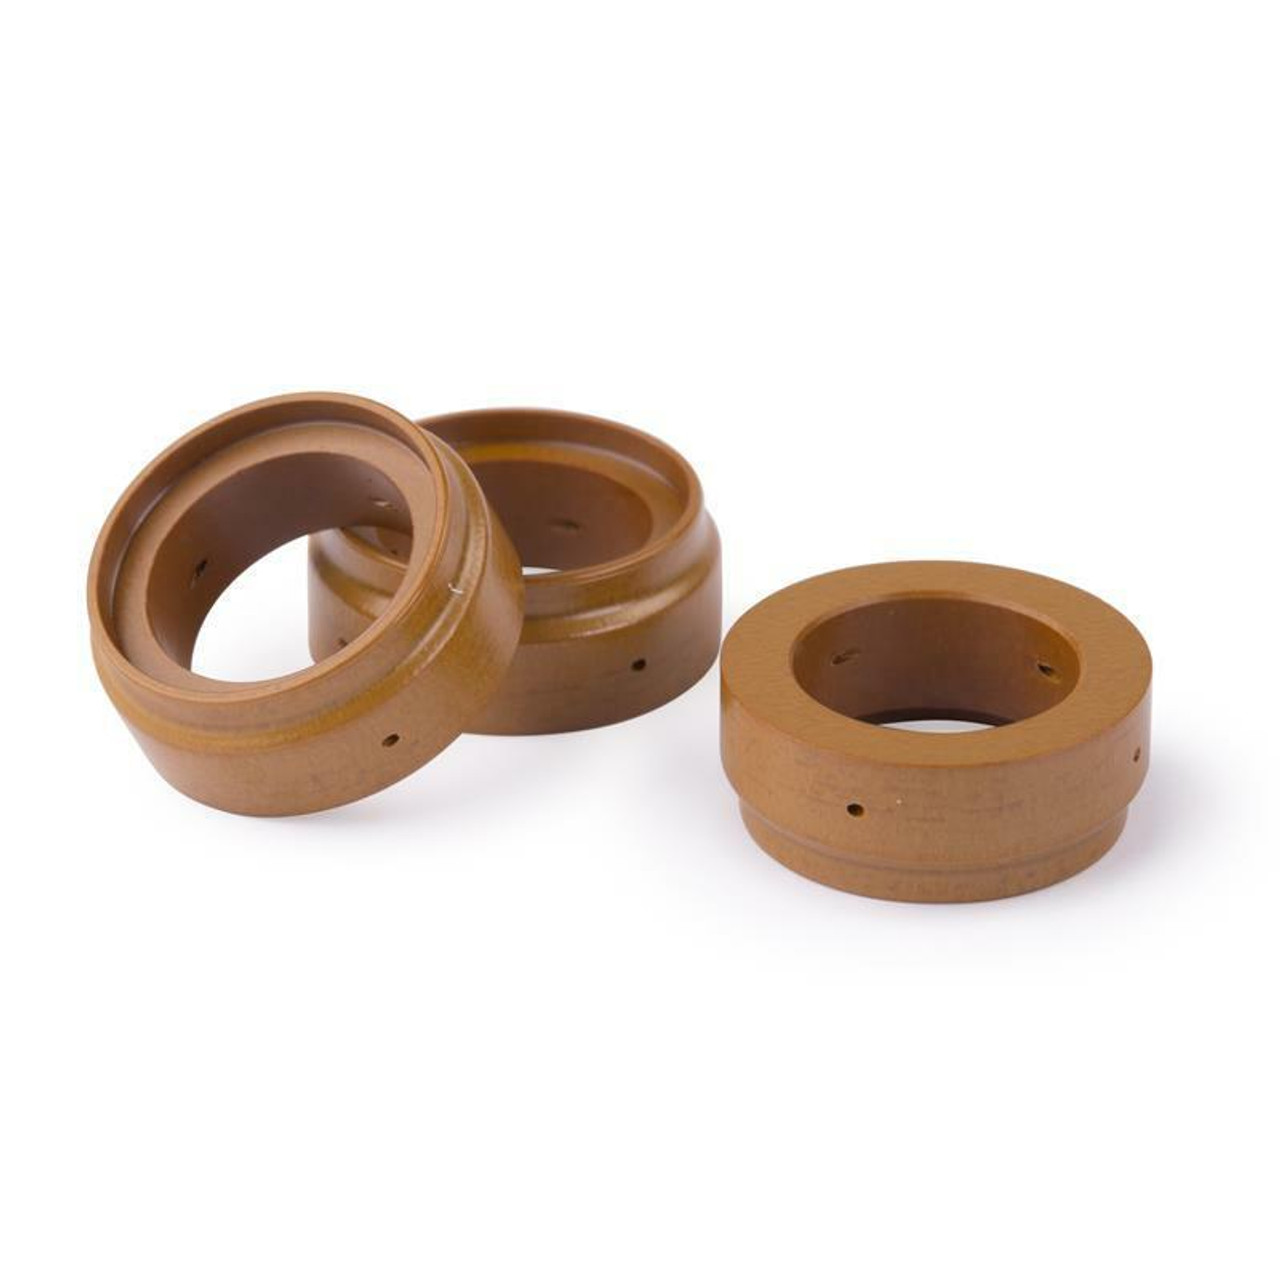 Lincoln Tomahawk 1000 Plasma Swirl Ring 3 Pack KP2844-14